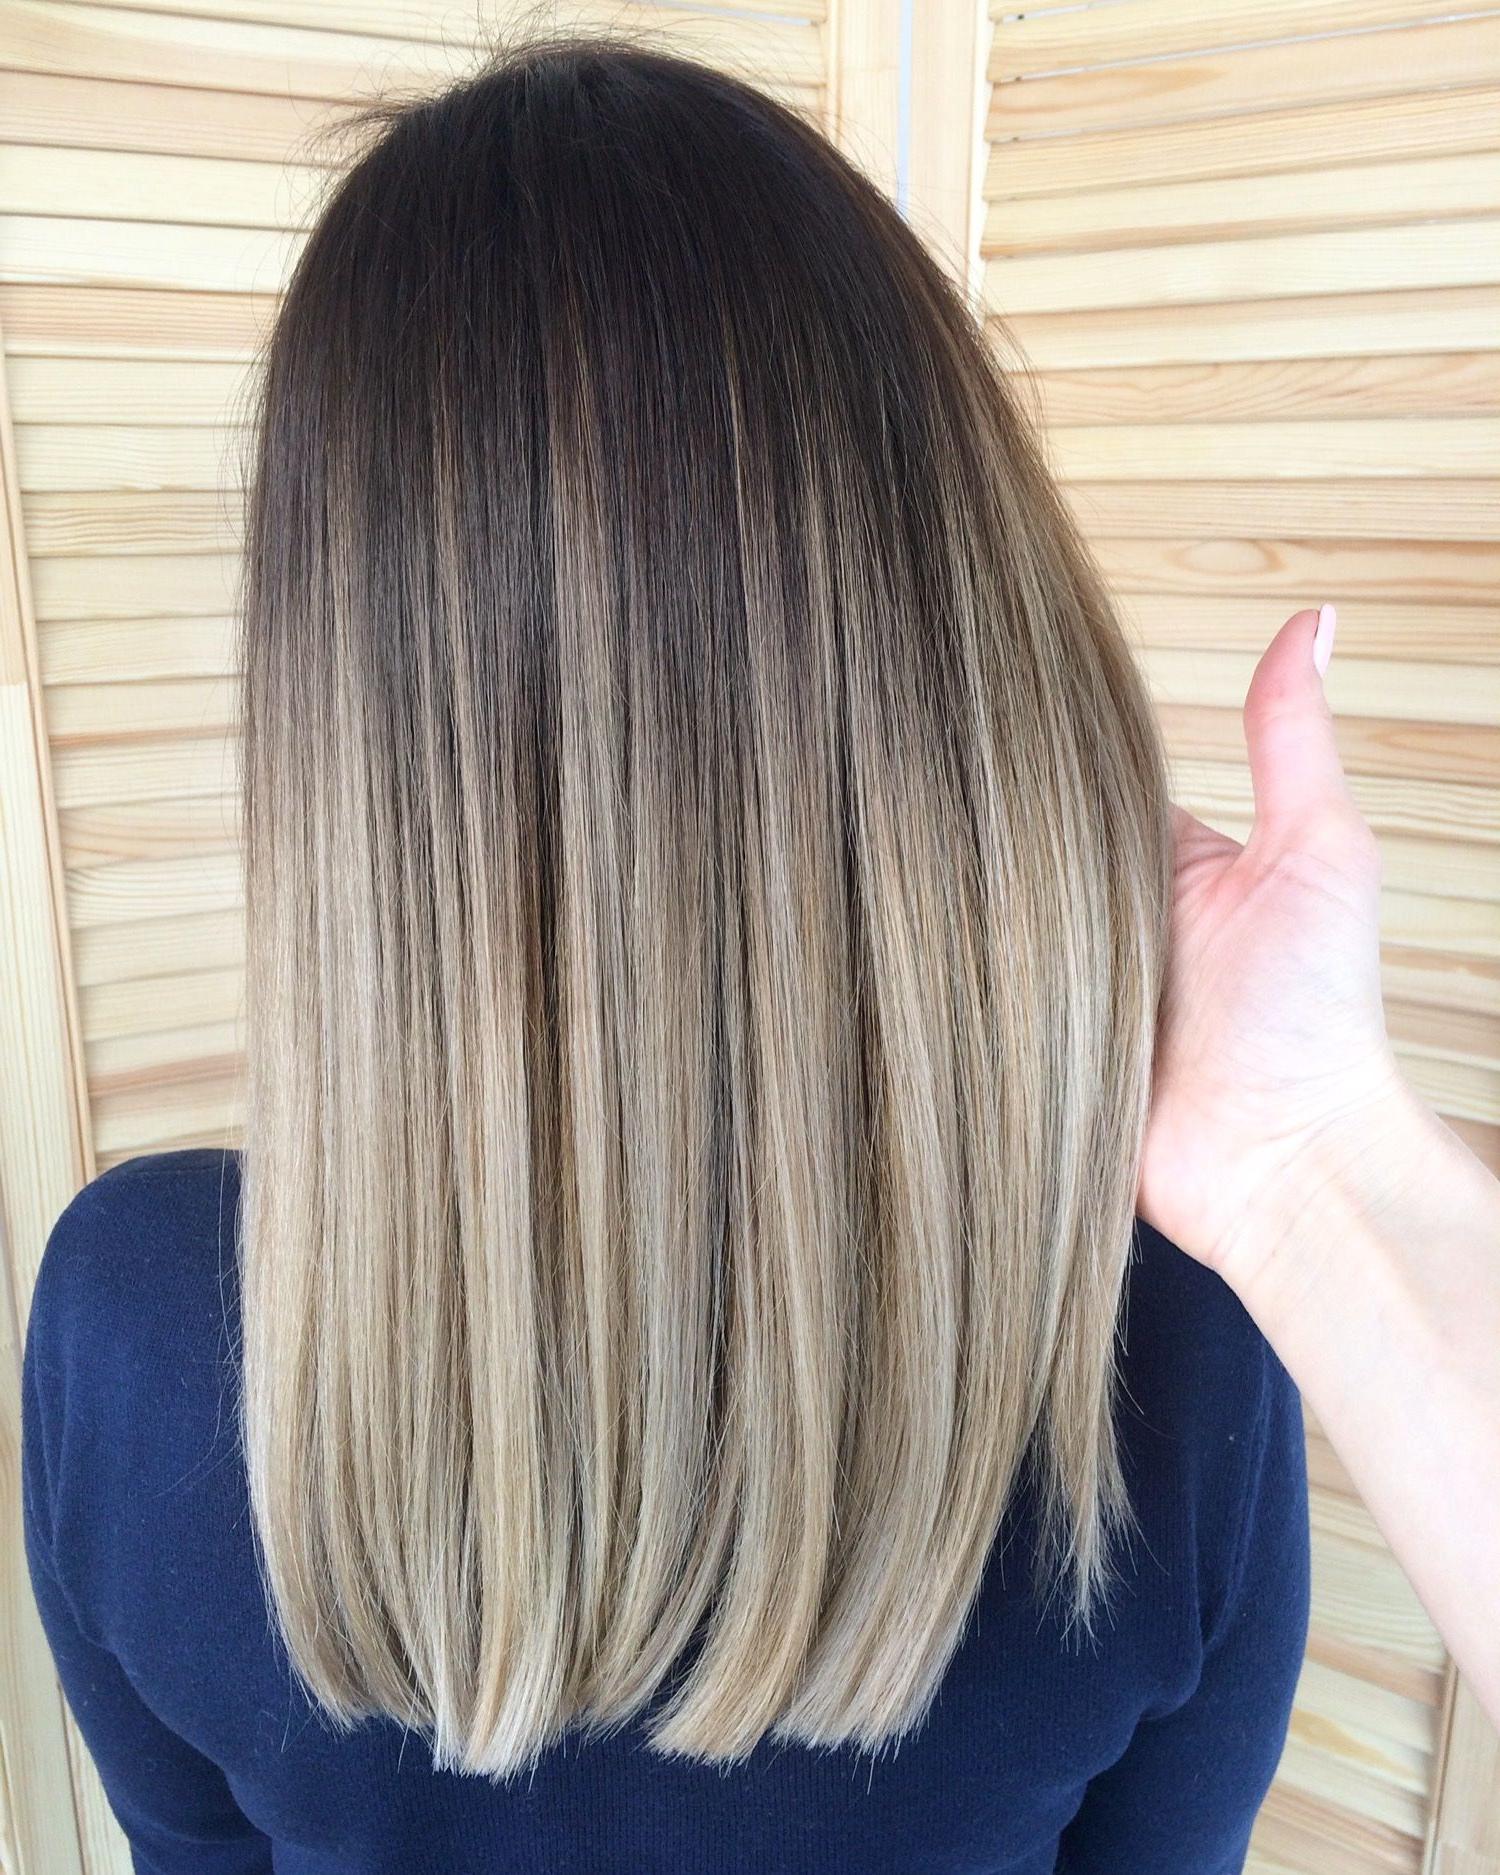 Pindorota Grcic On Окрашивание | Ash Blonde Balayage With Regard To Blonde Balayage On Short Dark Hairstyles (View 5 of 20)